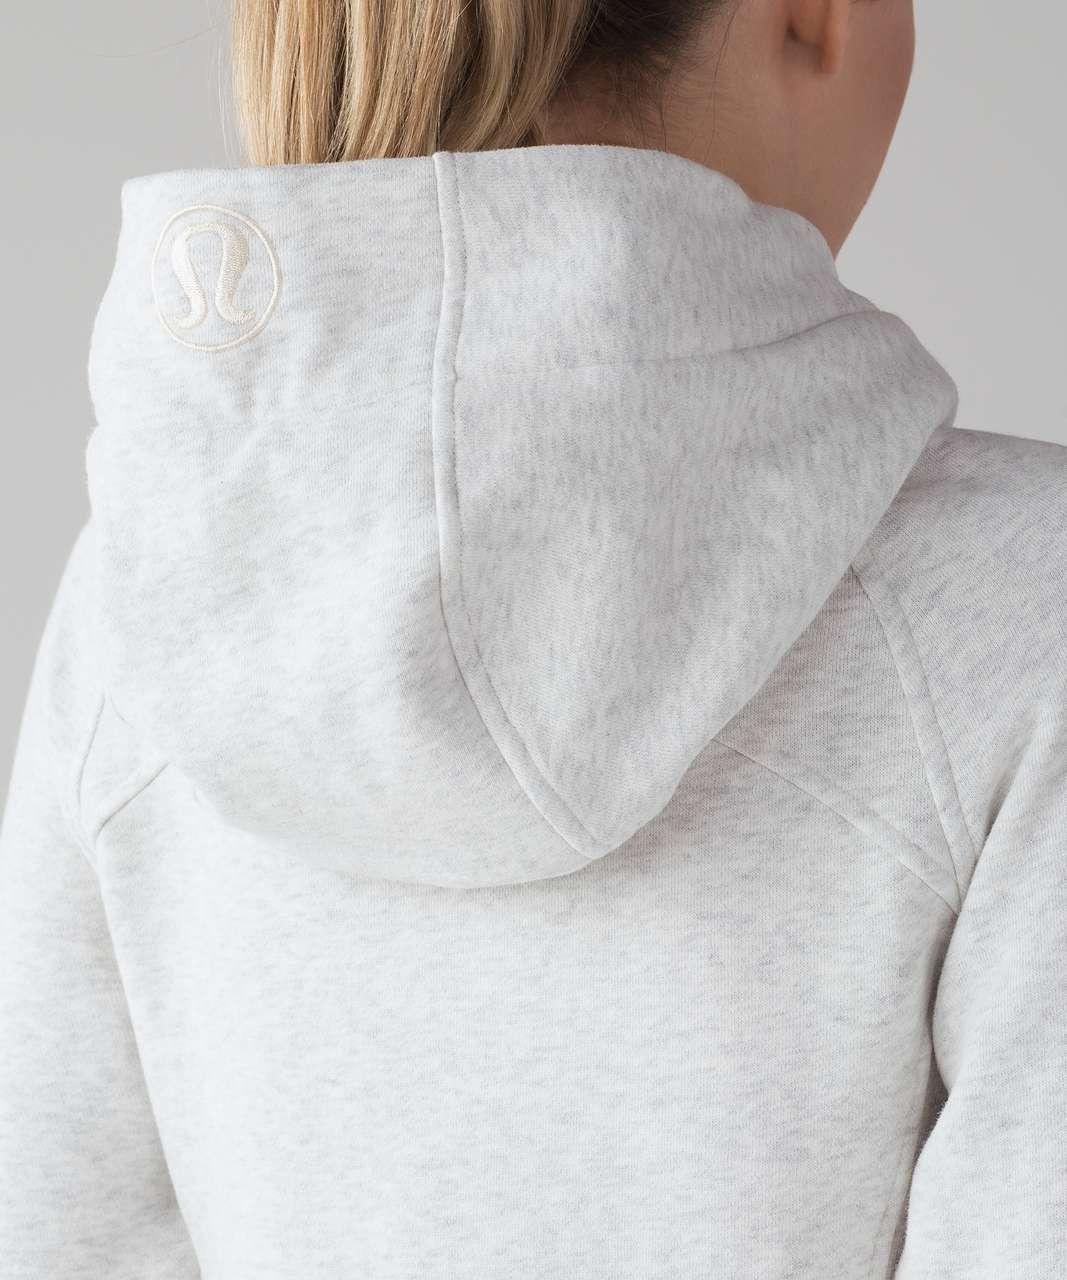 Lululemon Scuba Hoodie *Light Cotton Fleece - Heathered White (First Release)